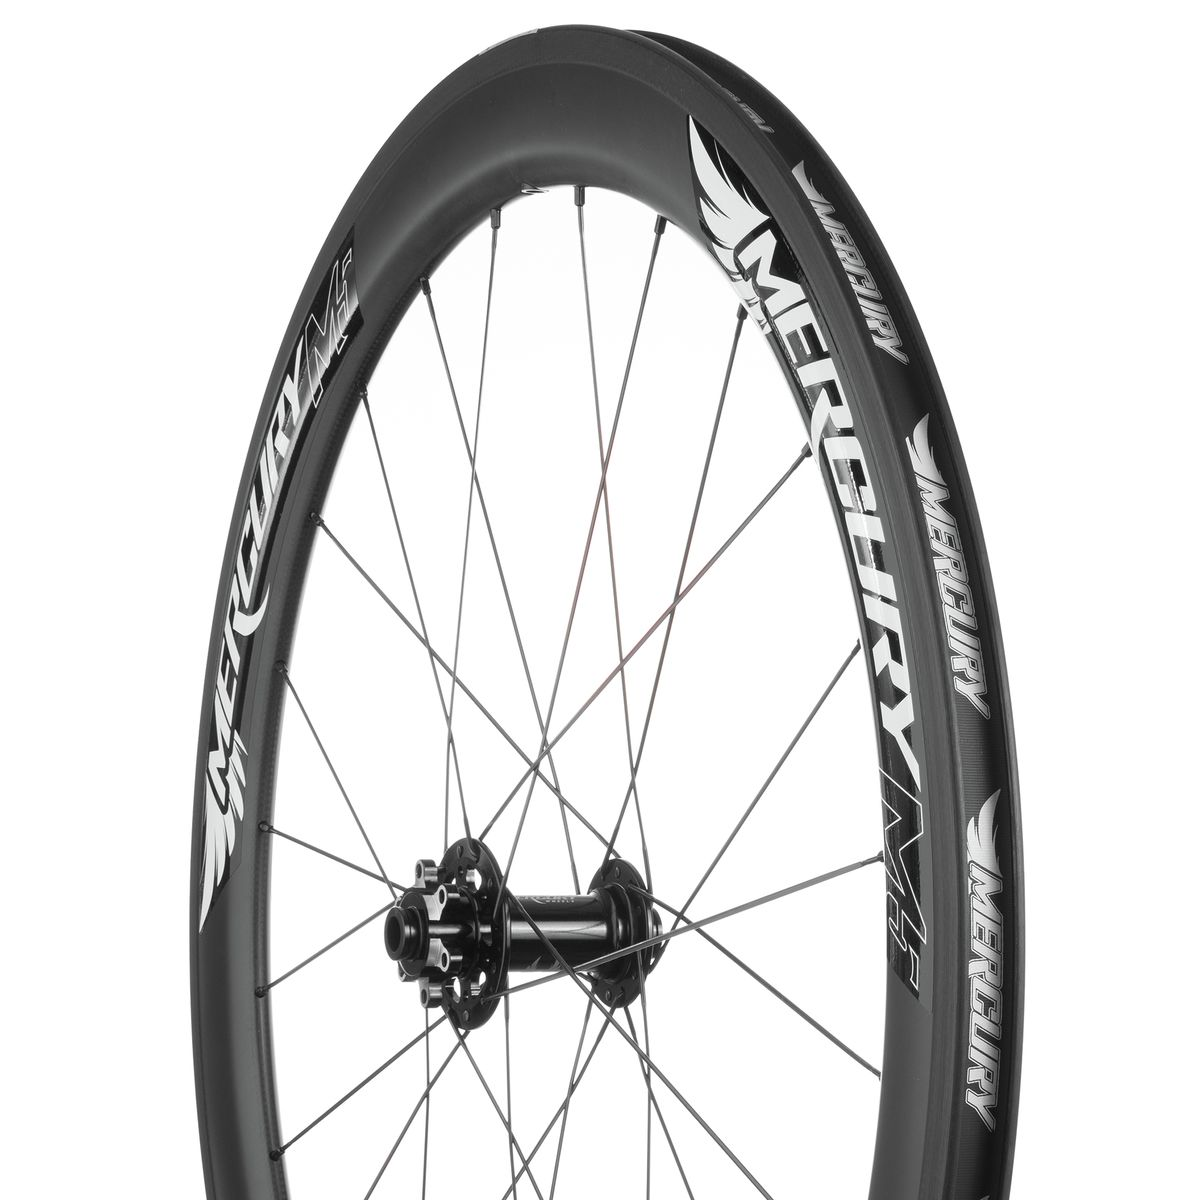 Mercury Wheels M5 Carbon Disc Wheelset Clincher Black 12 15x100 12x142mm Shimano SRAM